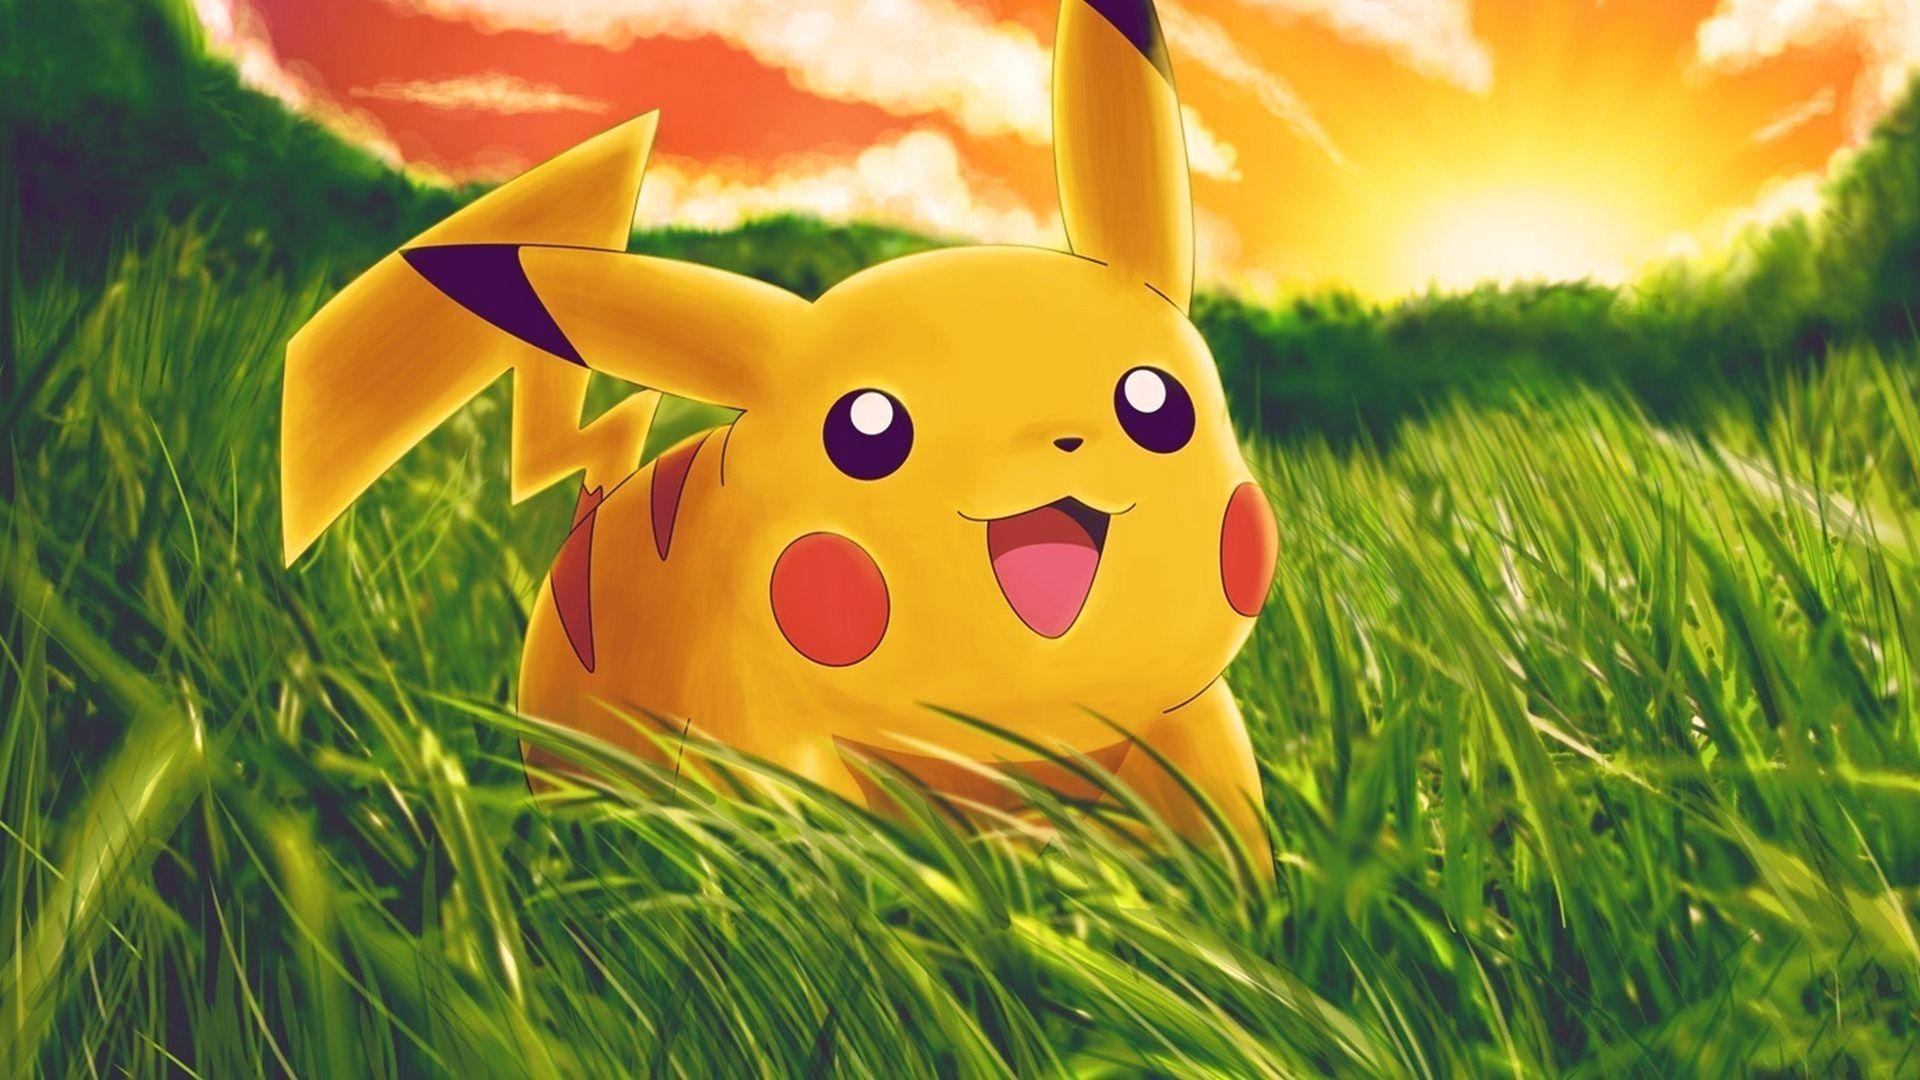 Pikachu 4k Wallpapers - Top Free Pikachu 4k Backgrounds ...